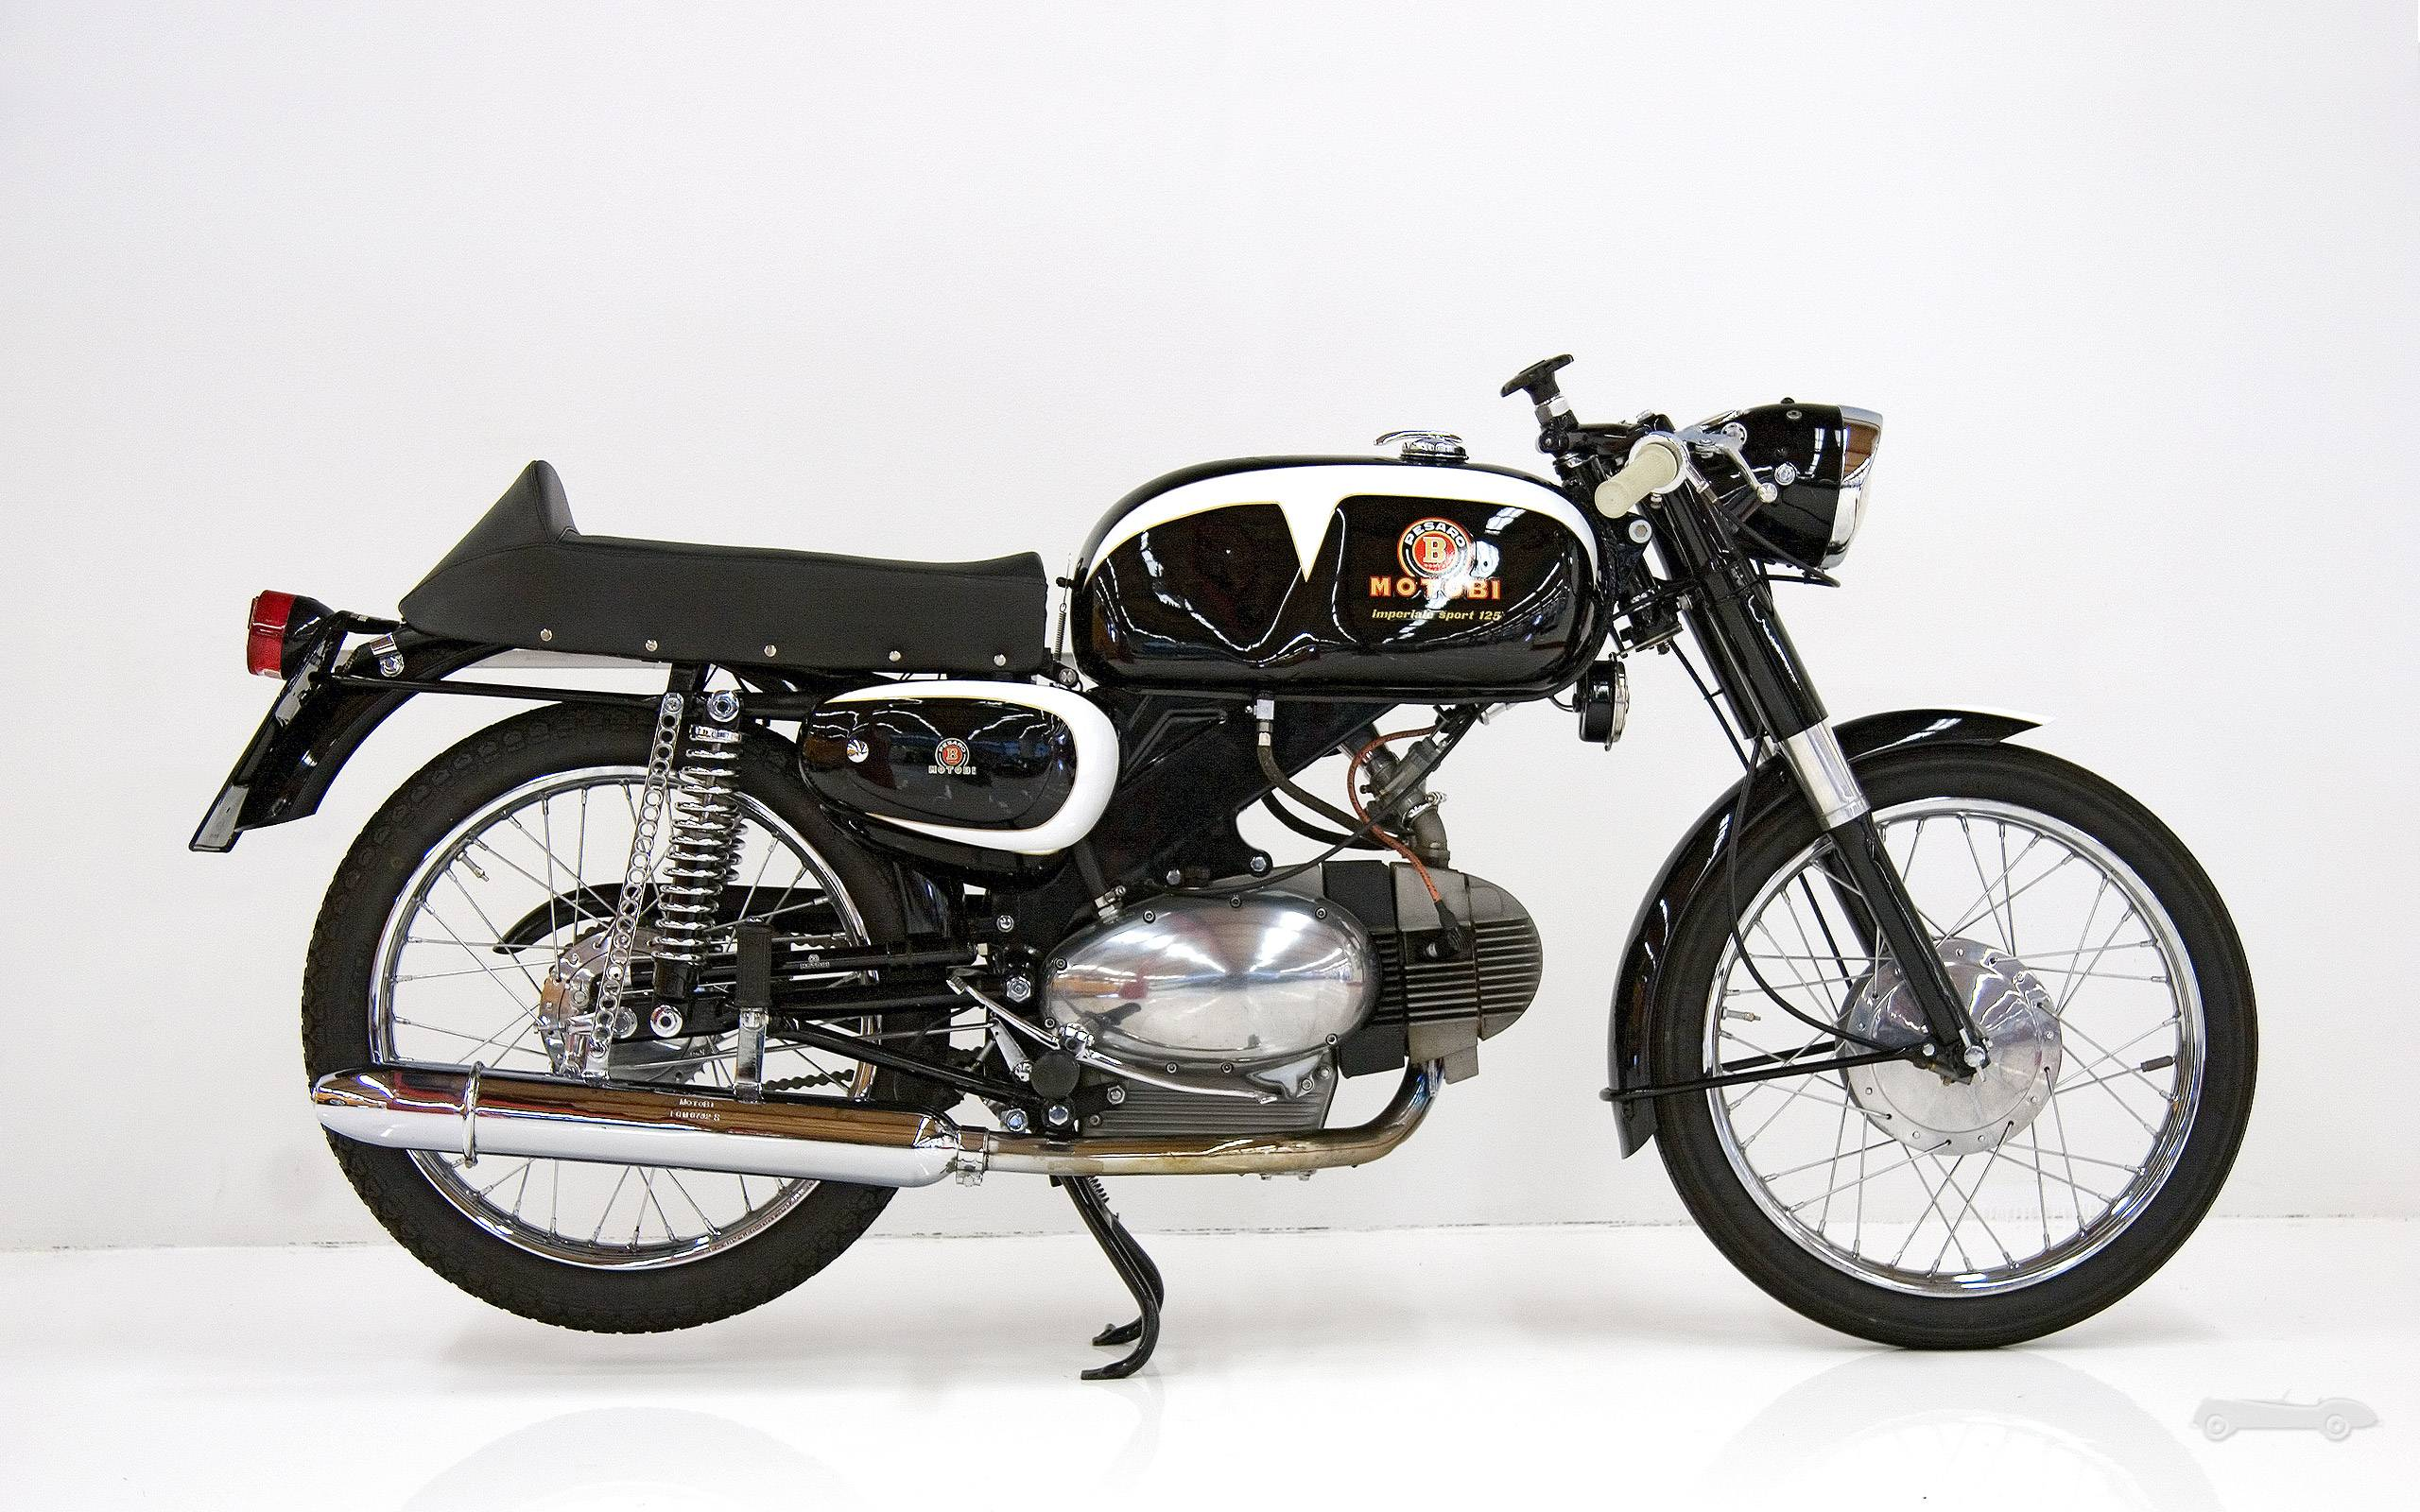 Vintage Motorcycle Wallpapers 2560x1600